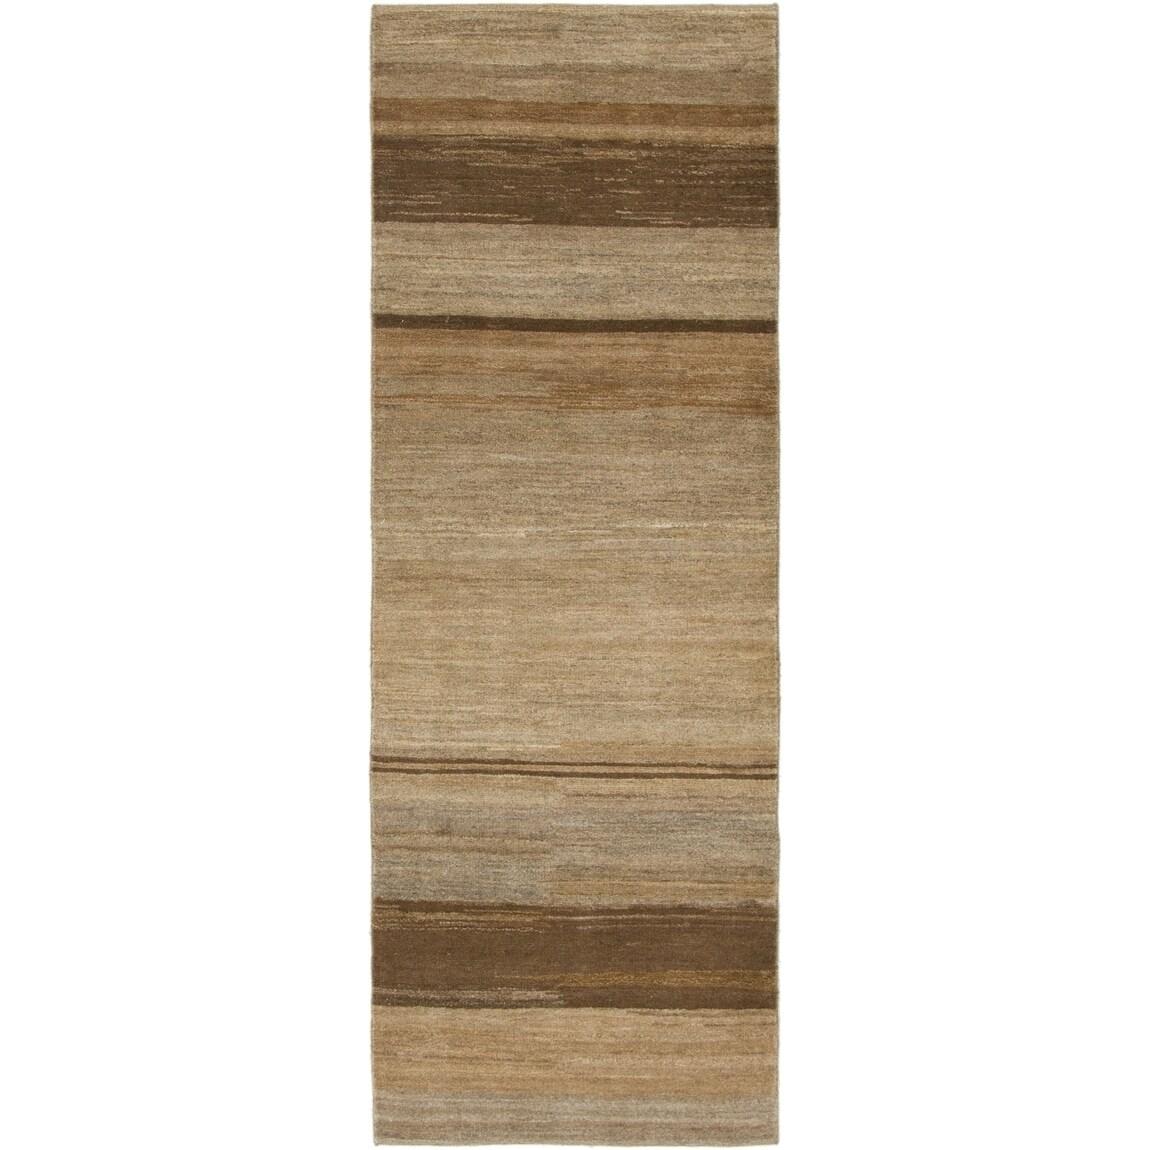 Hand Knotted Kashkuli Gabbeh Wool Runner Rug - 2 8 x 8 (Light brown - 2 8 x 8)